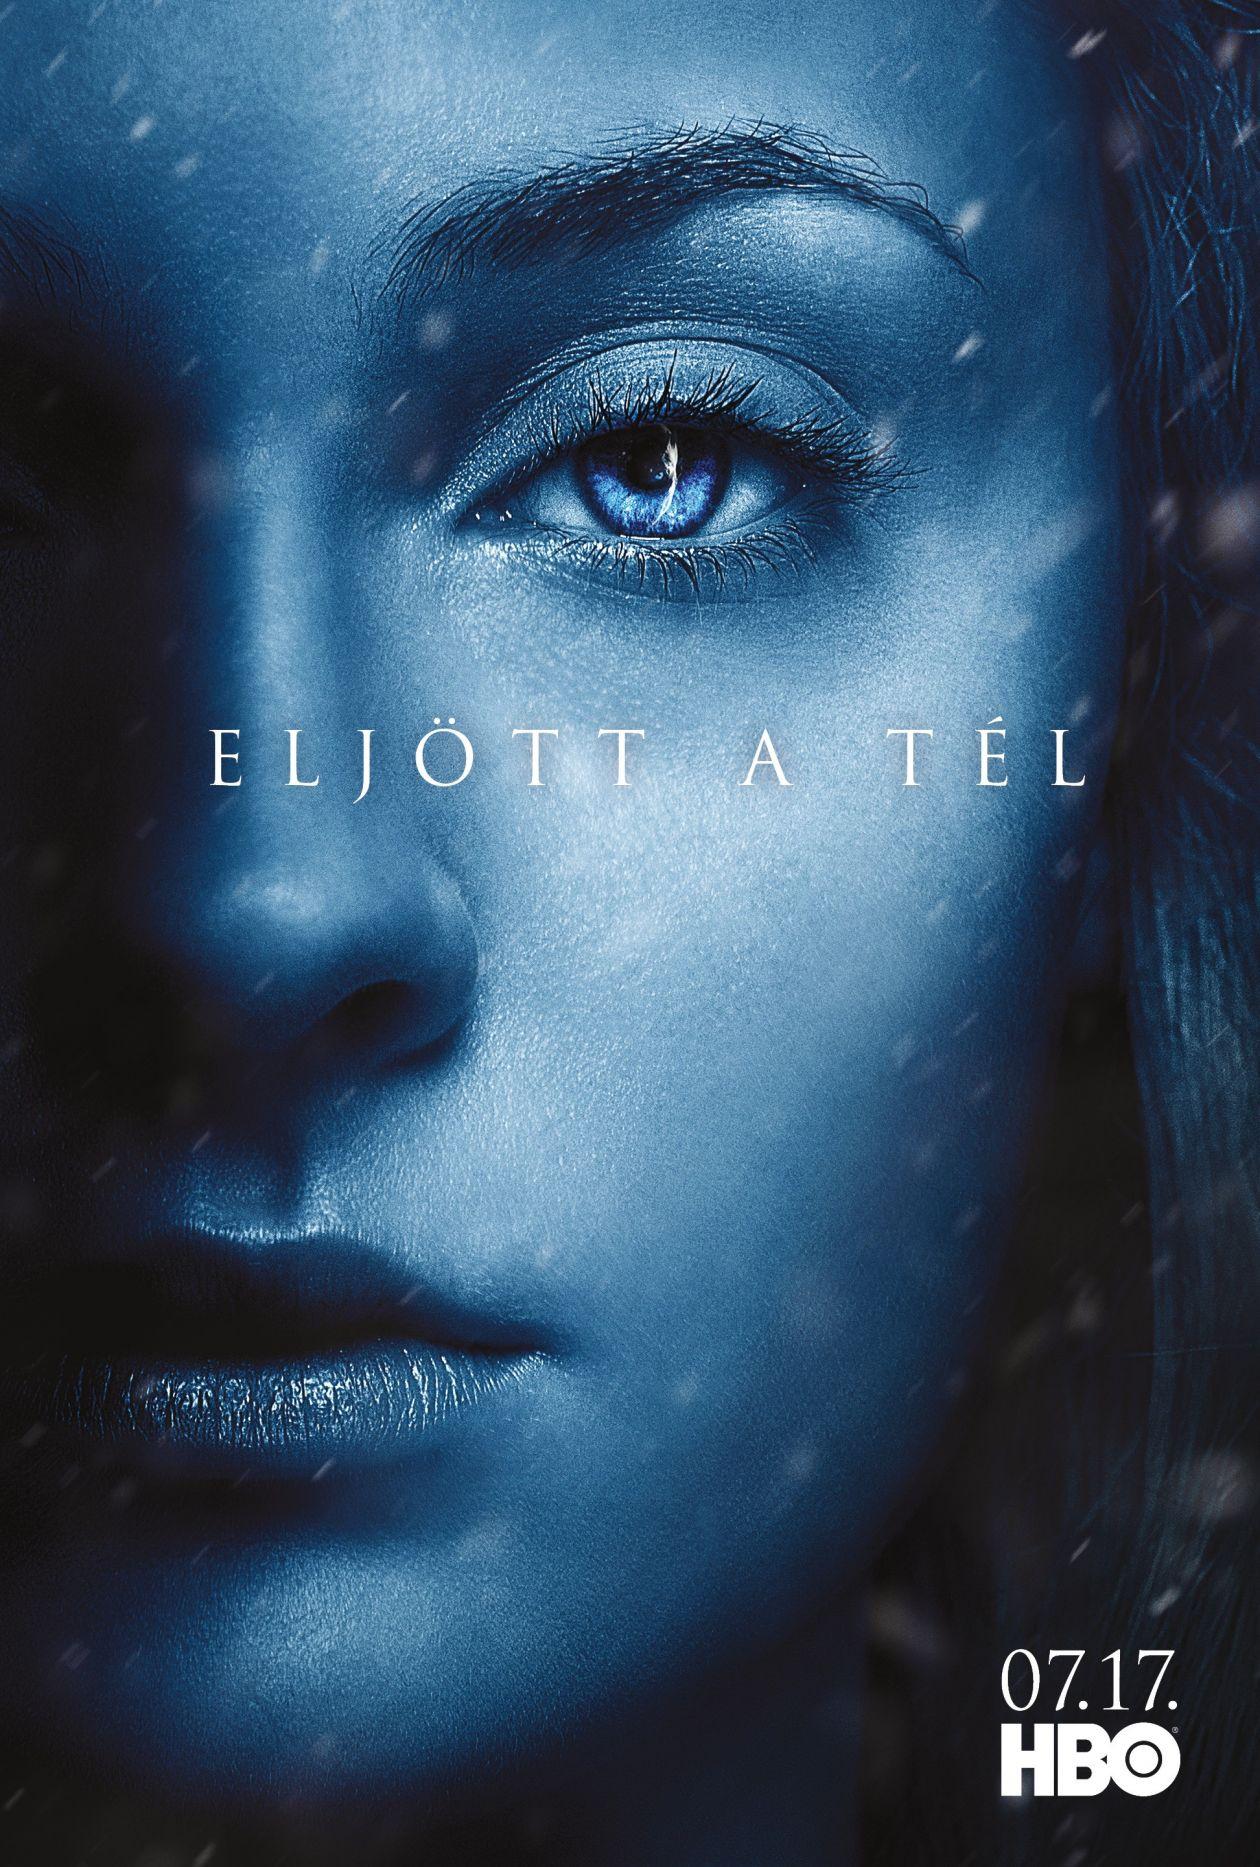 Sophie Turner actress   Game of Thrones / Sansa Stark SEASON 7 2017 SERIES POSTER AFFICHE